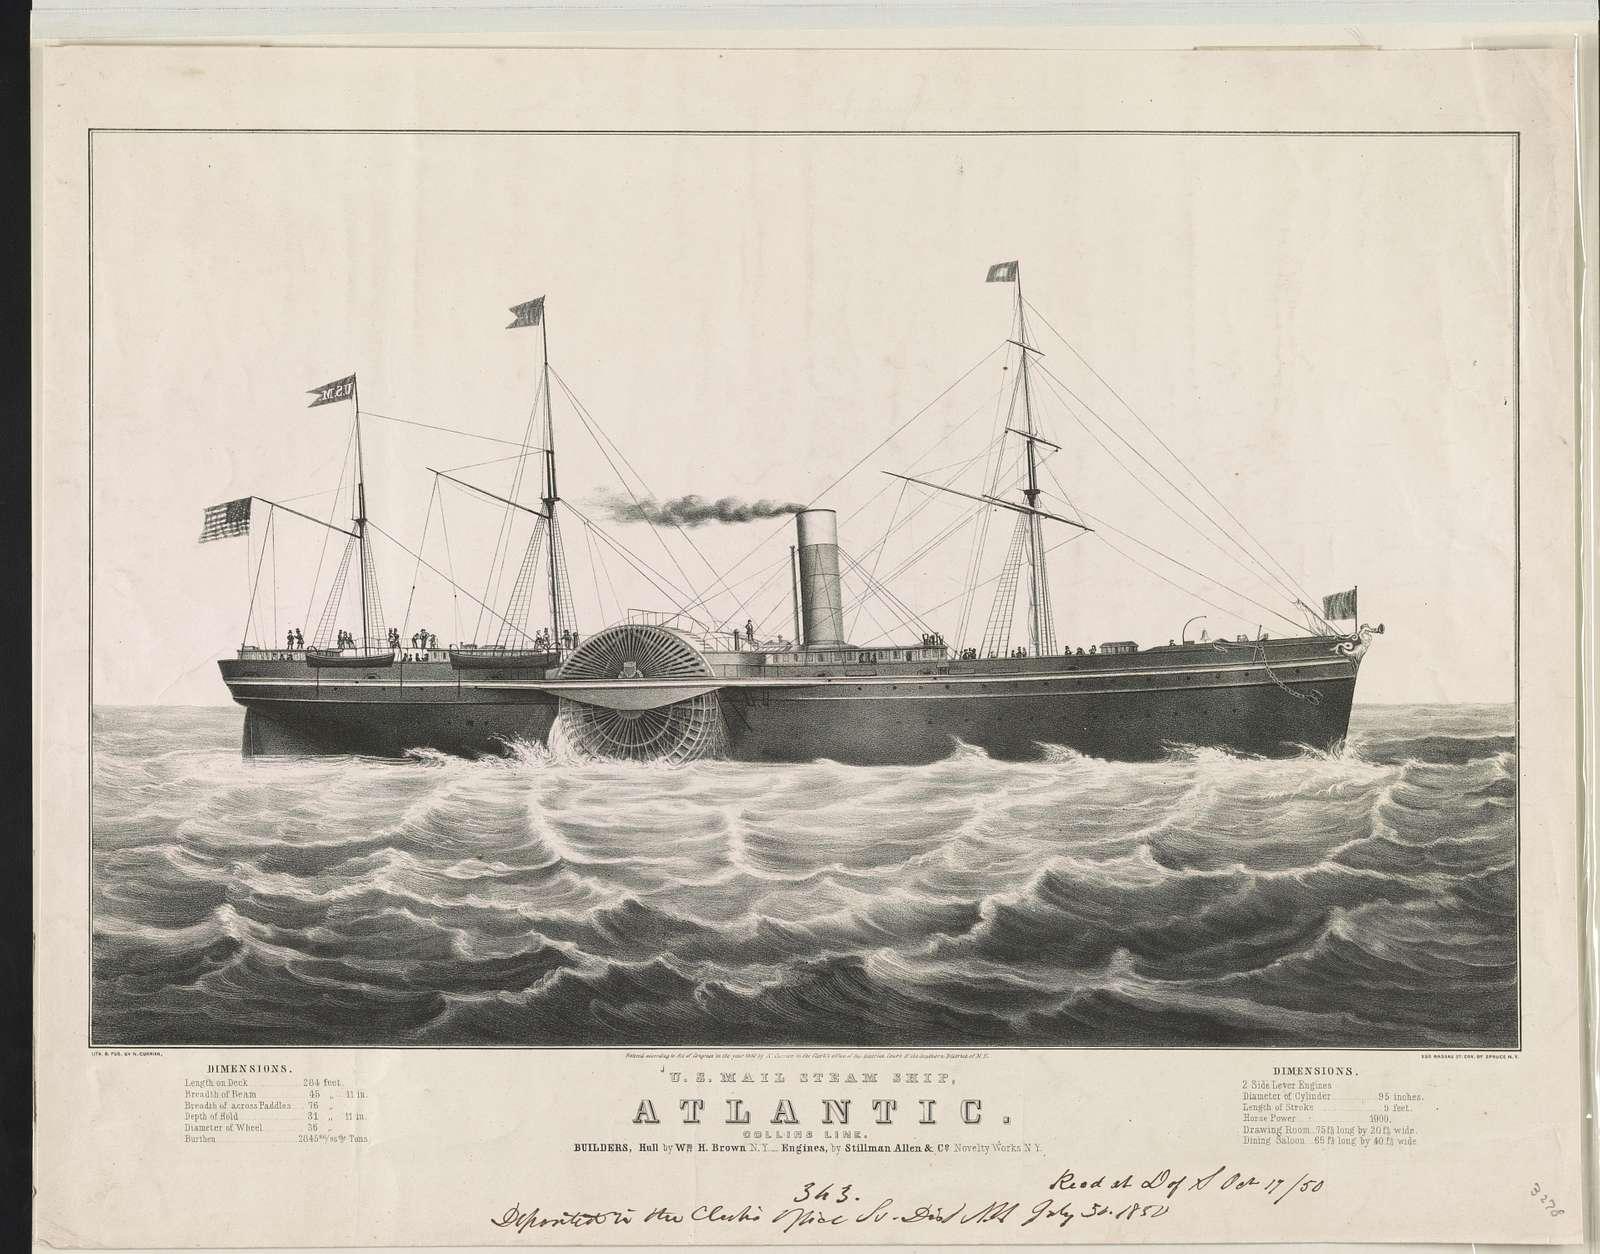 U.S. mail steam ship, Atlantic: Collins line. builders, hull by Wm. H. Brown N.Y.--engines, by Stillman Allen & Co. Novelty Works N.Y.